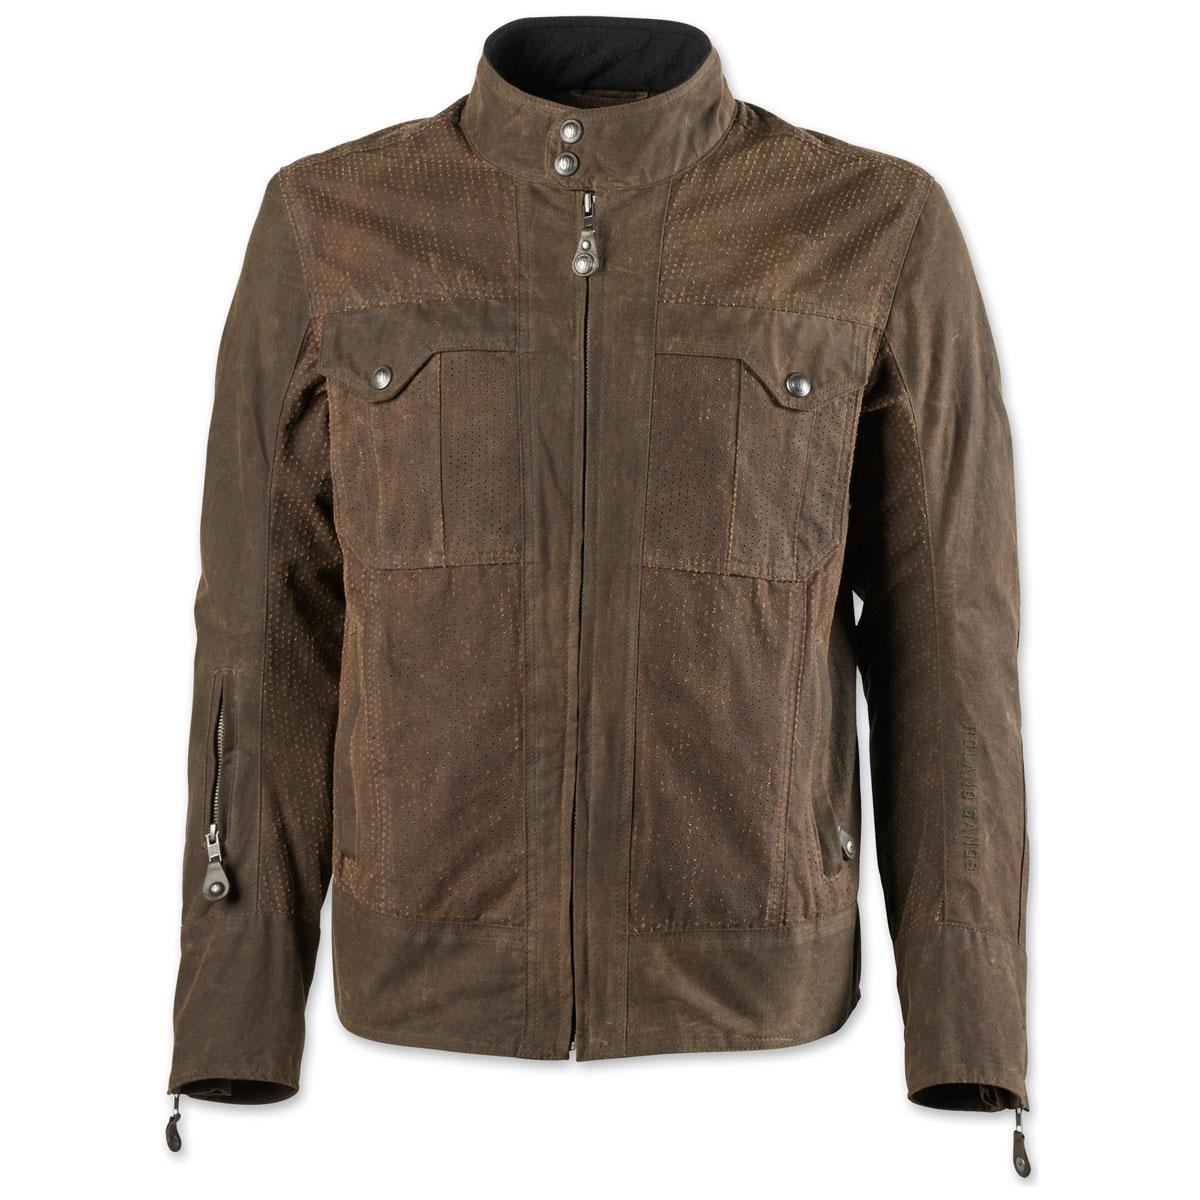 Roland Sands Design Apparel Men's Duro Perf Waxed Cotton Ranger Jacket